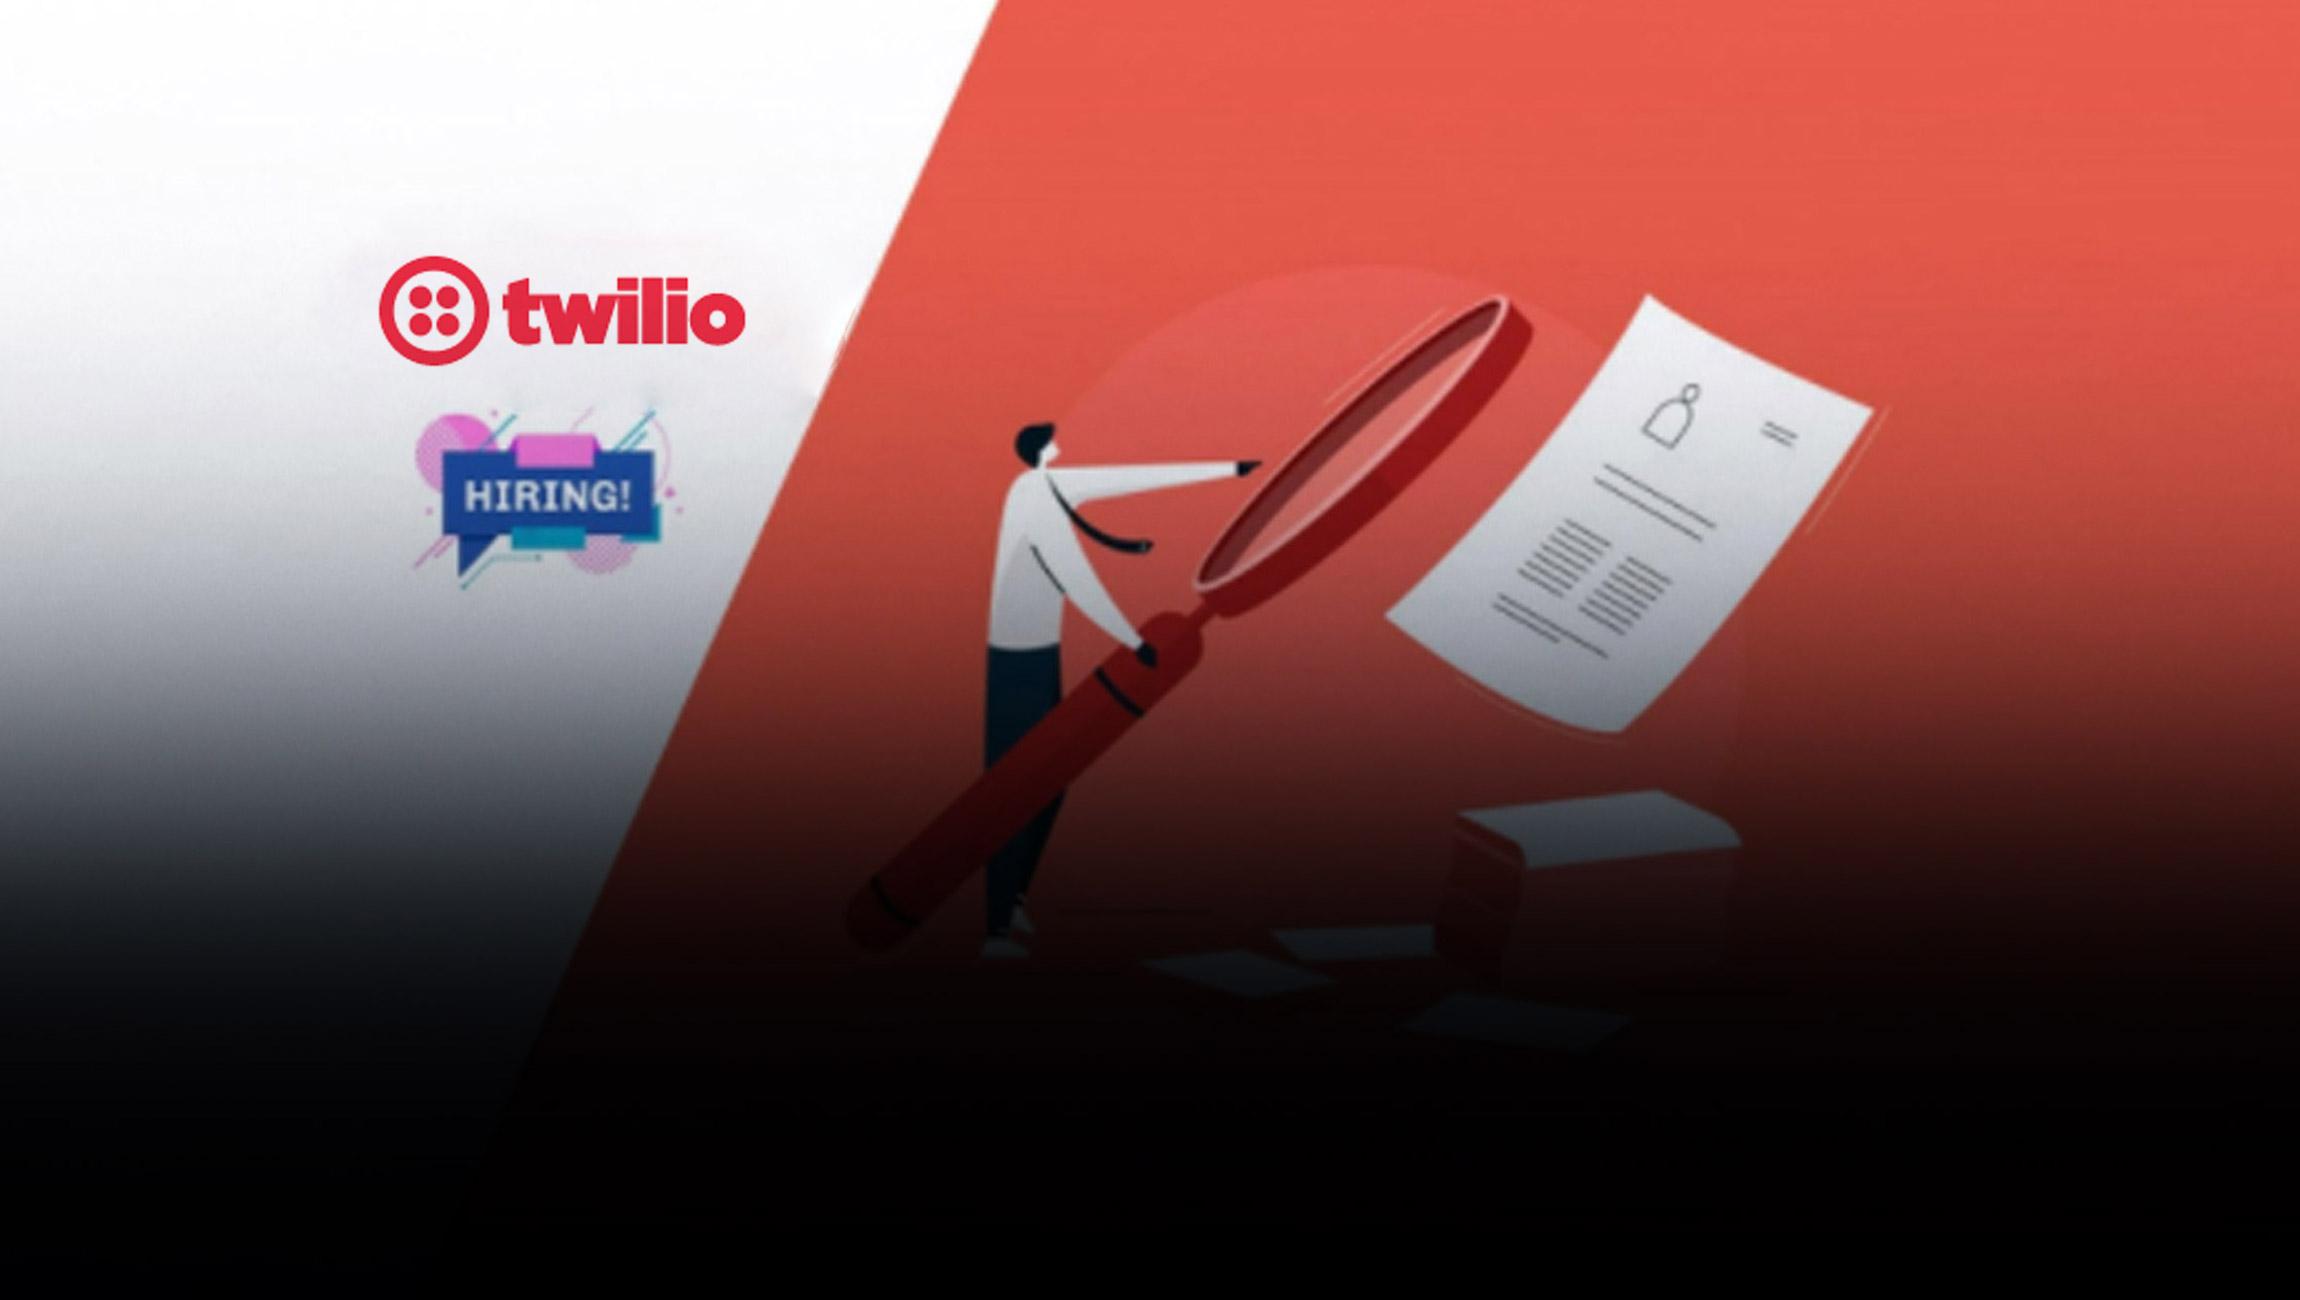 Twilio Welcomes Deval Patrick to Twilio Board of Directors